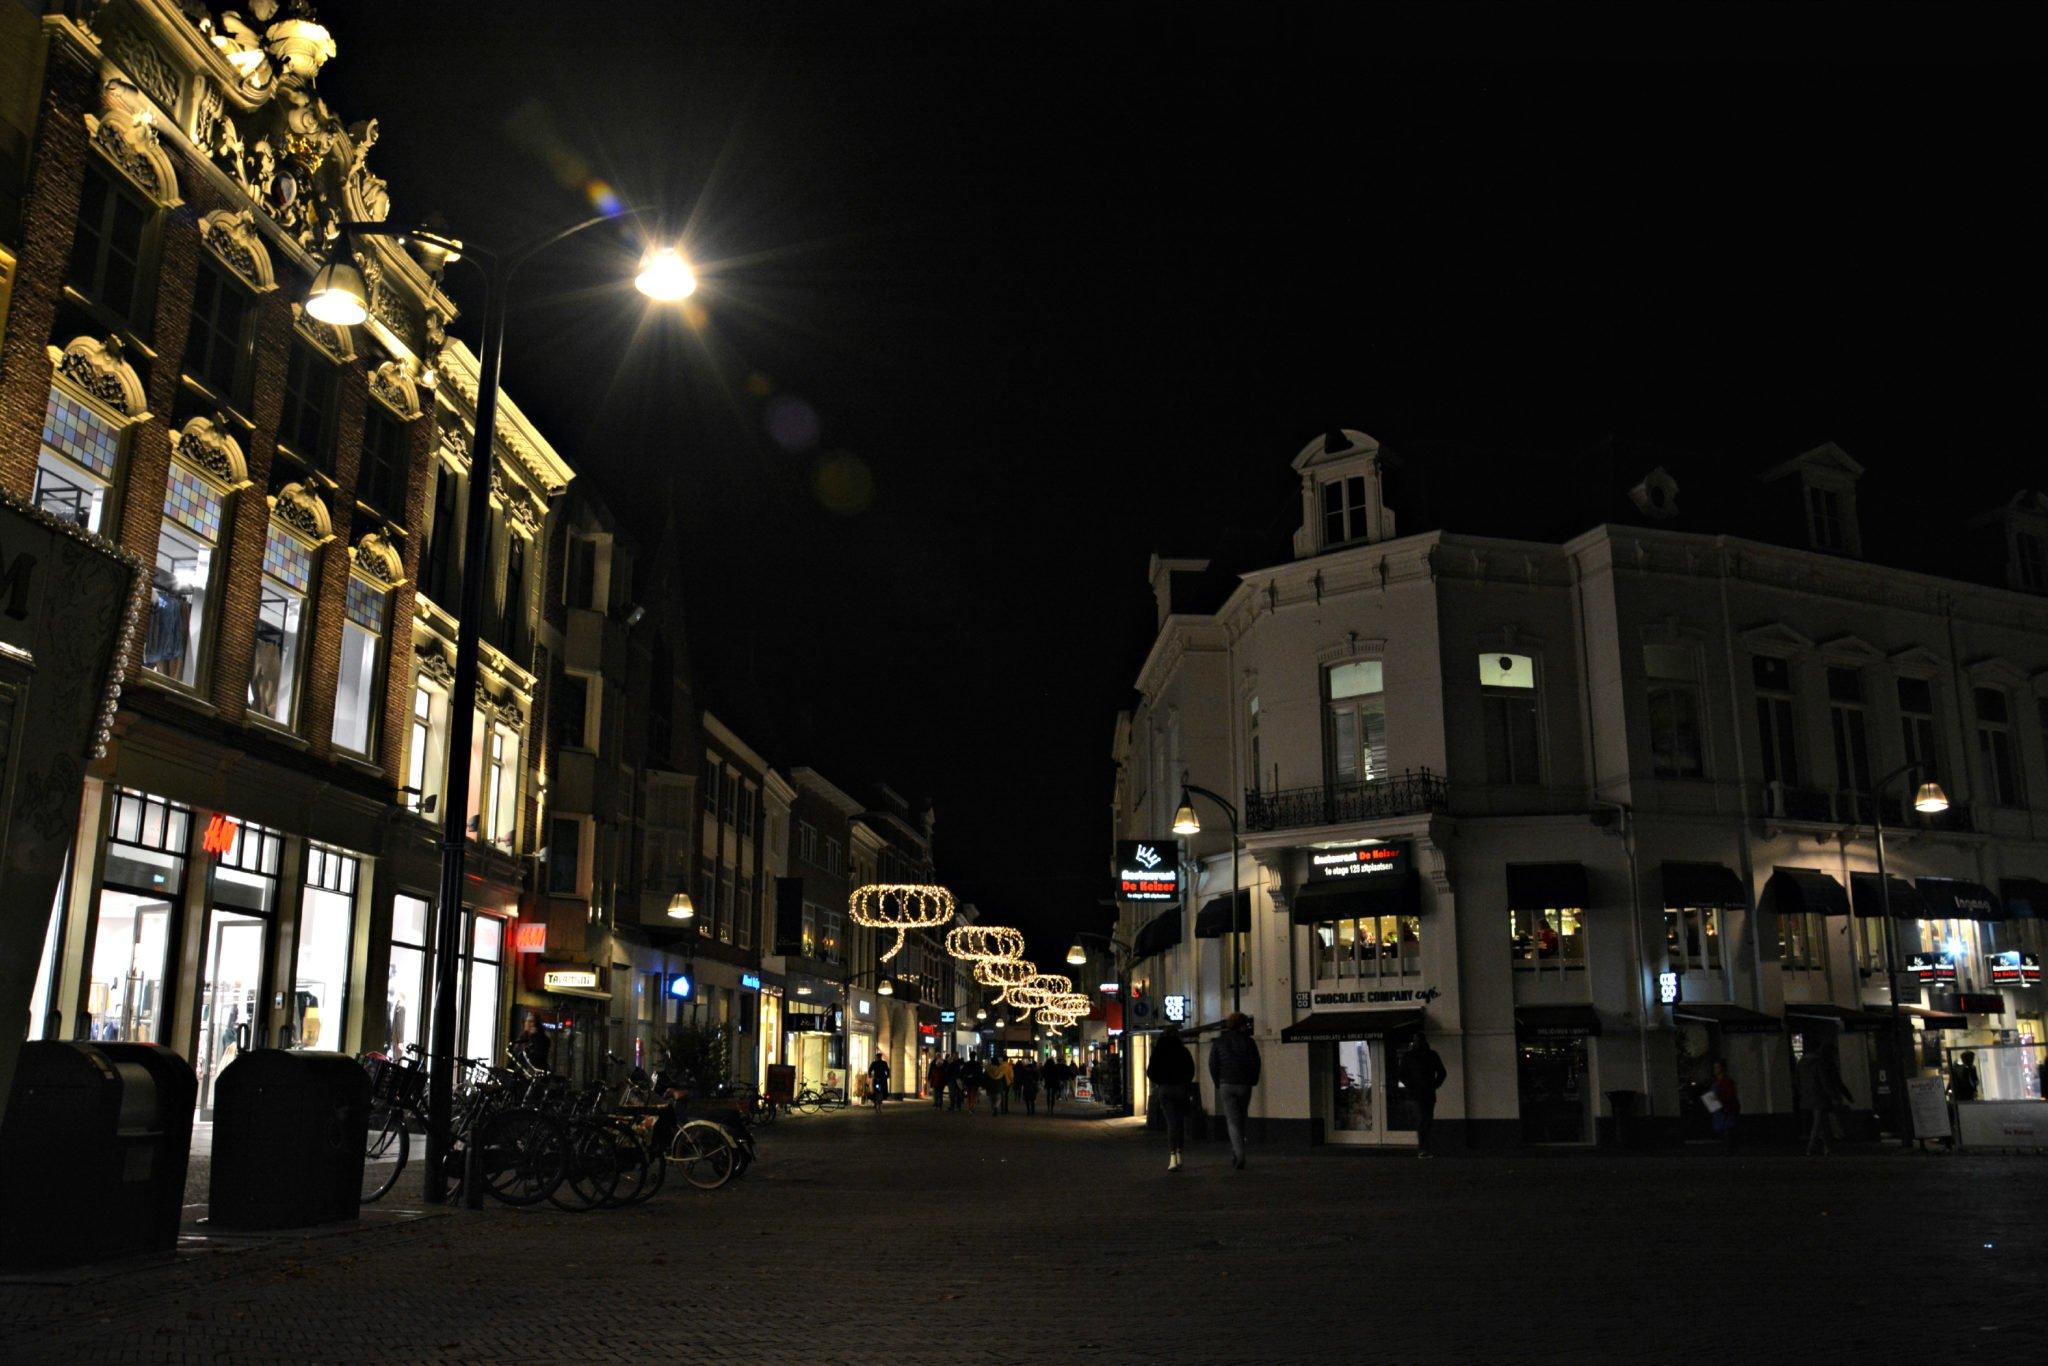 sfeerverlichting-binnenstad-koopavond